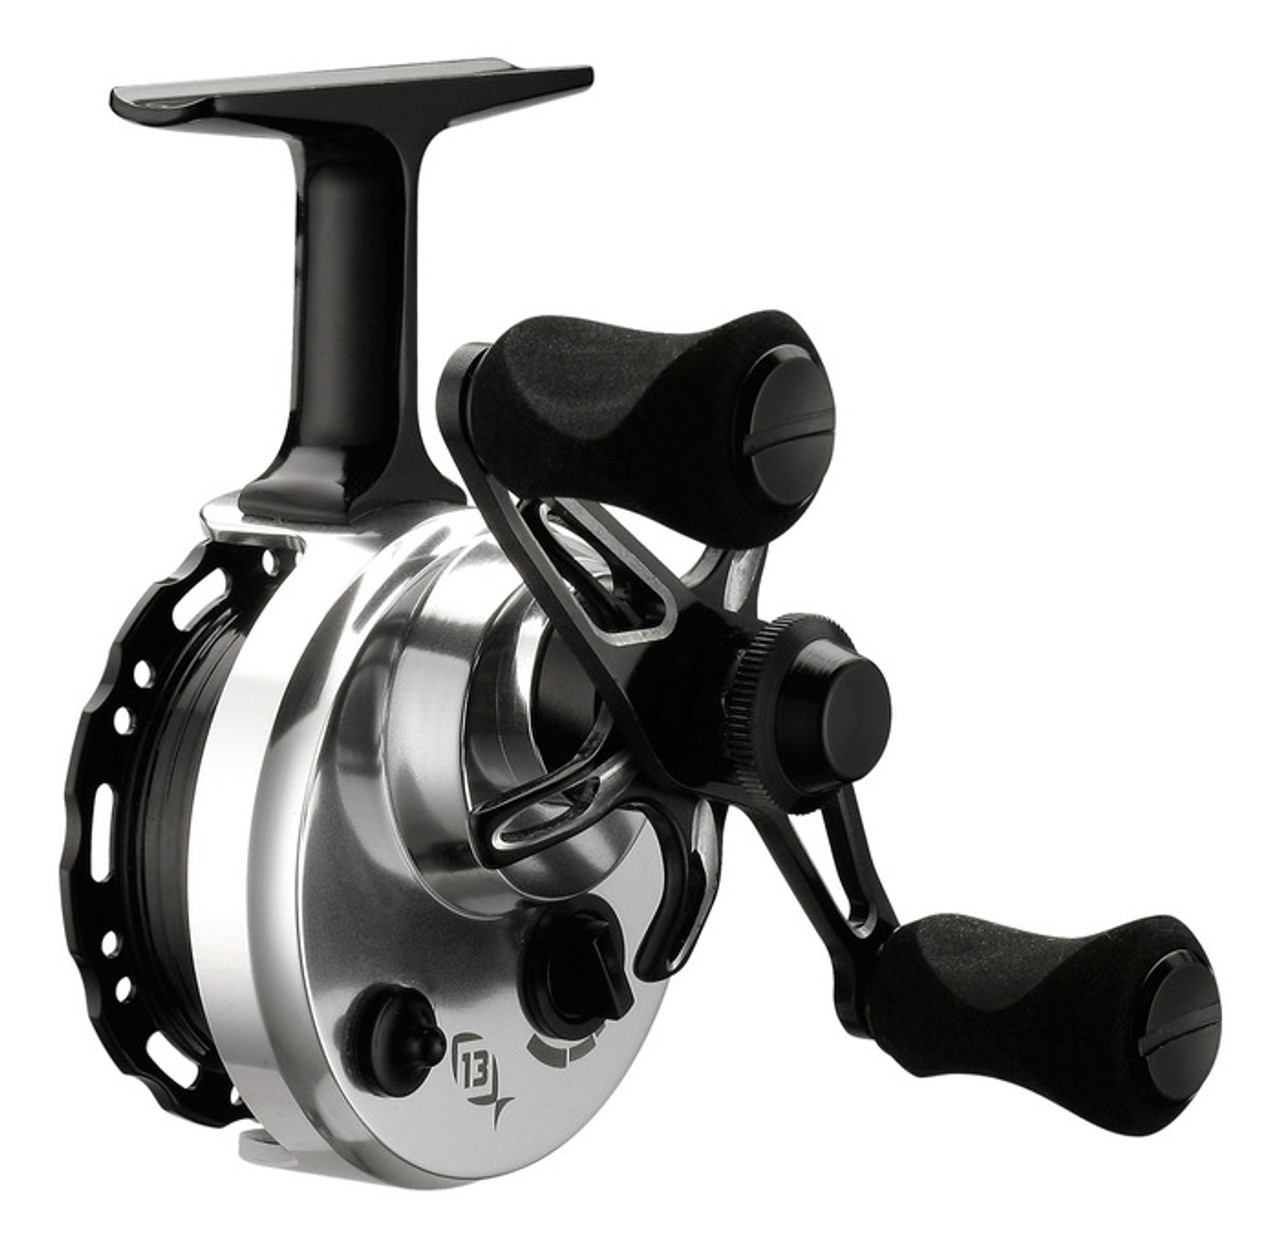 13 Fishing Black Betty 6061 Inline Ice fishing Reel (LH Retrieve)